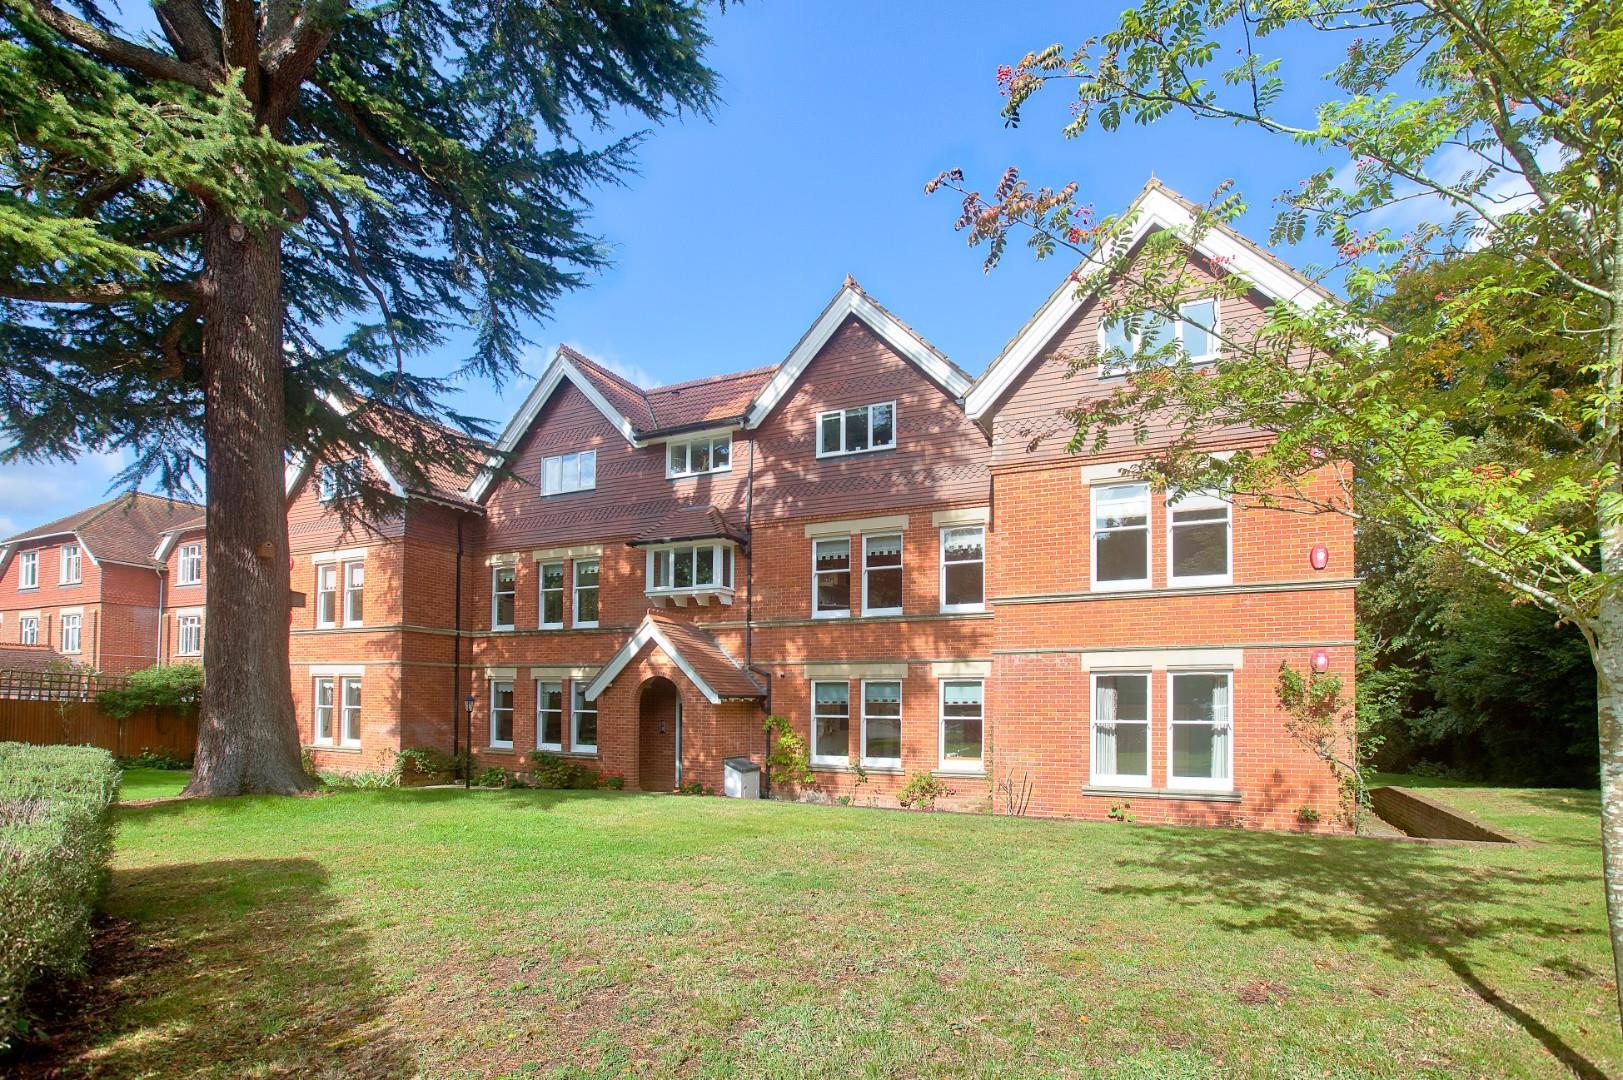 Hazelmere House, 74 Harnham Road, Salisbury